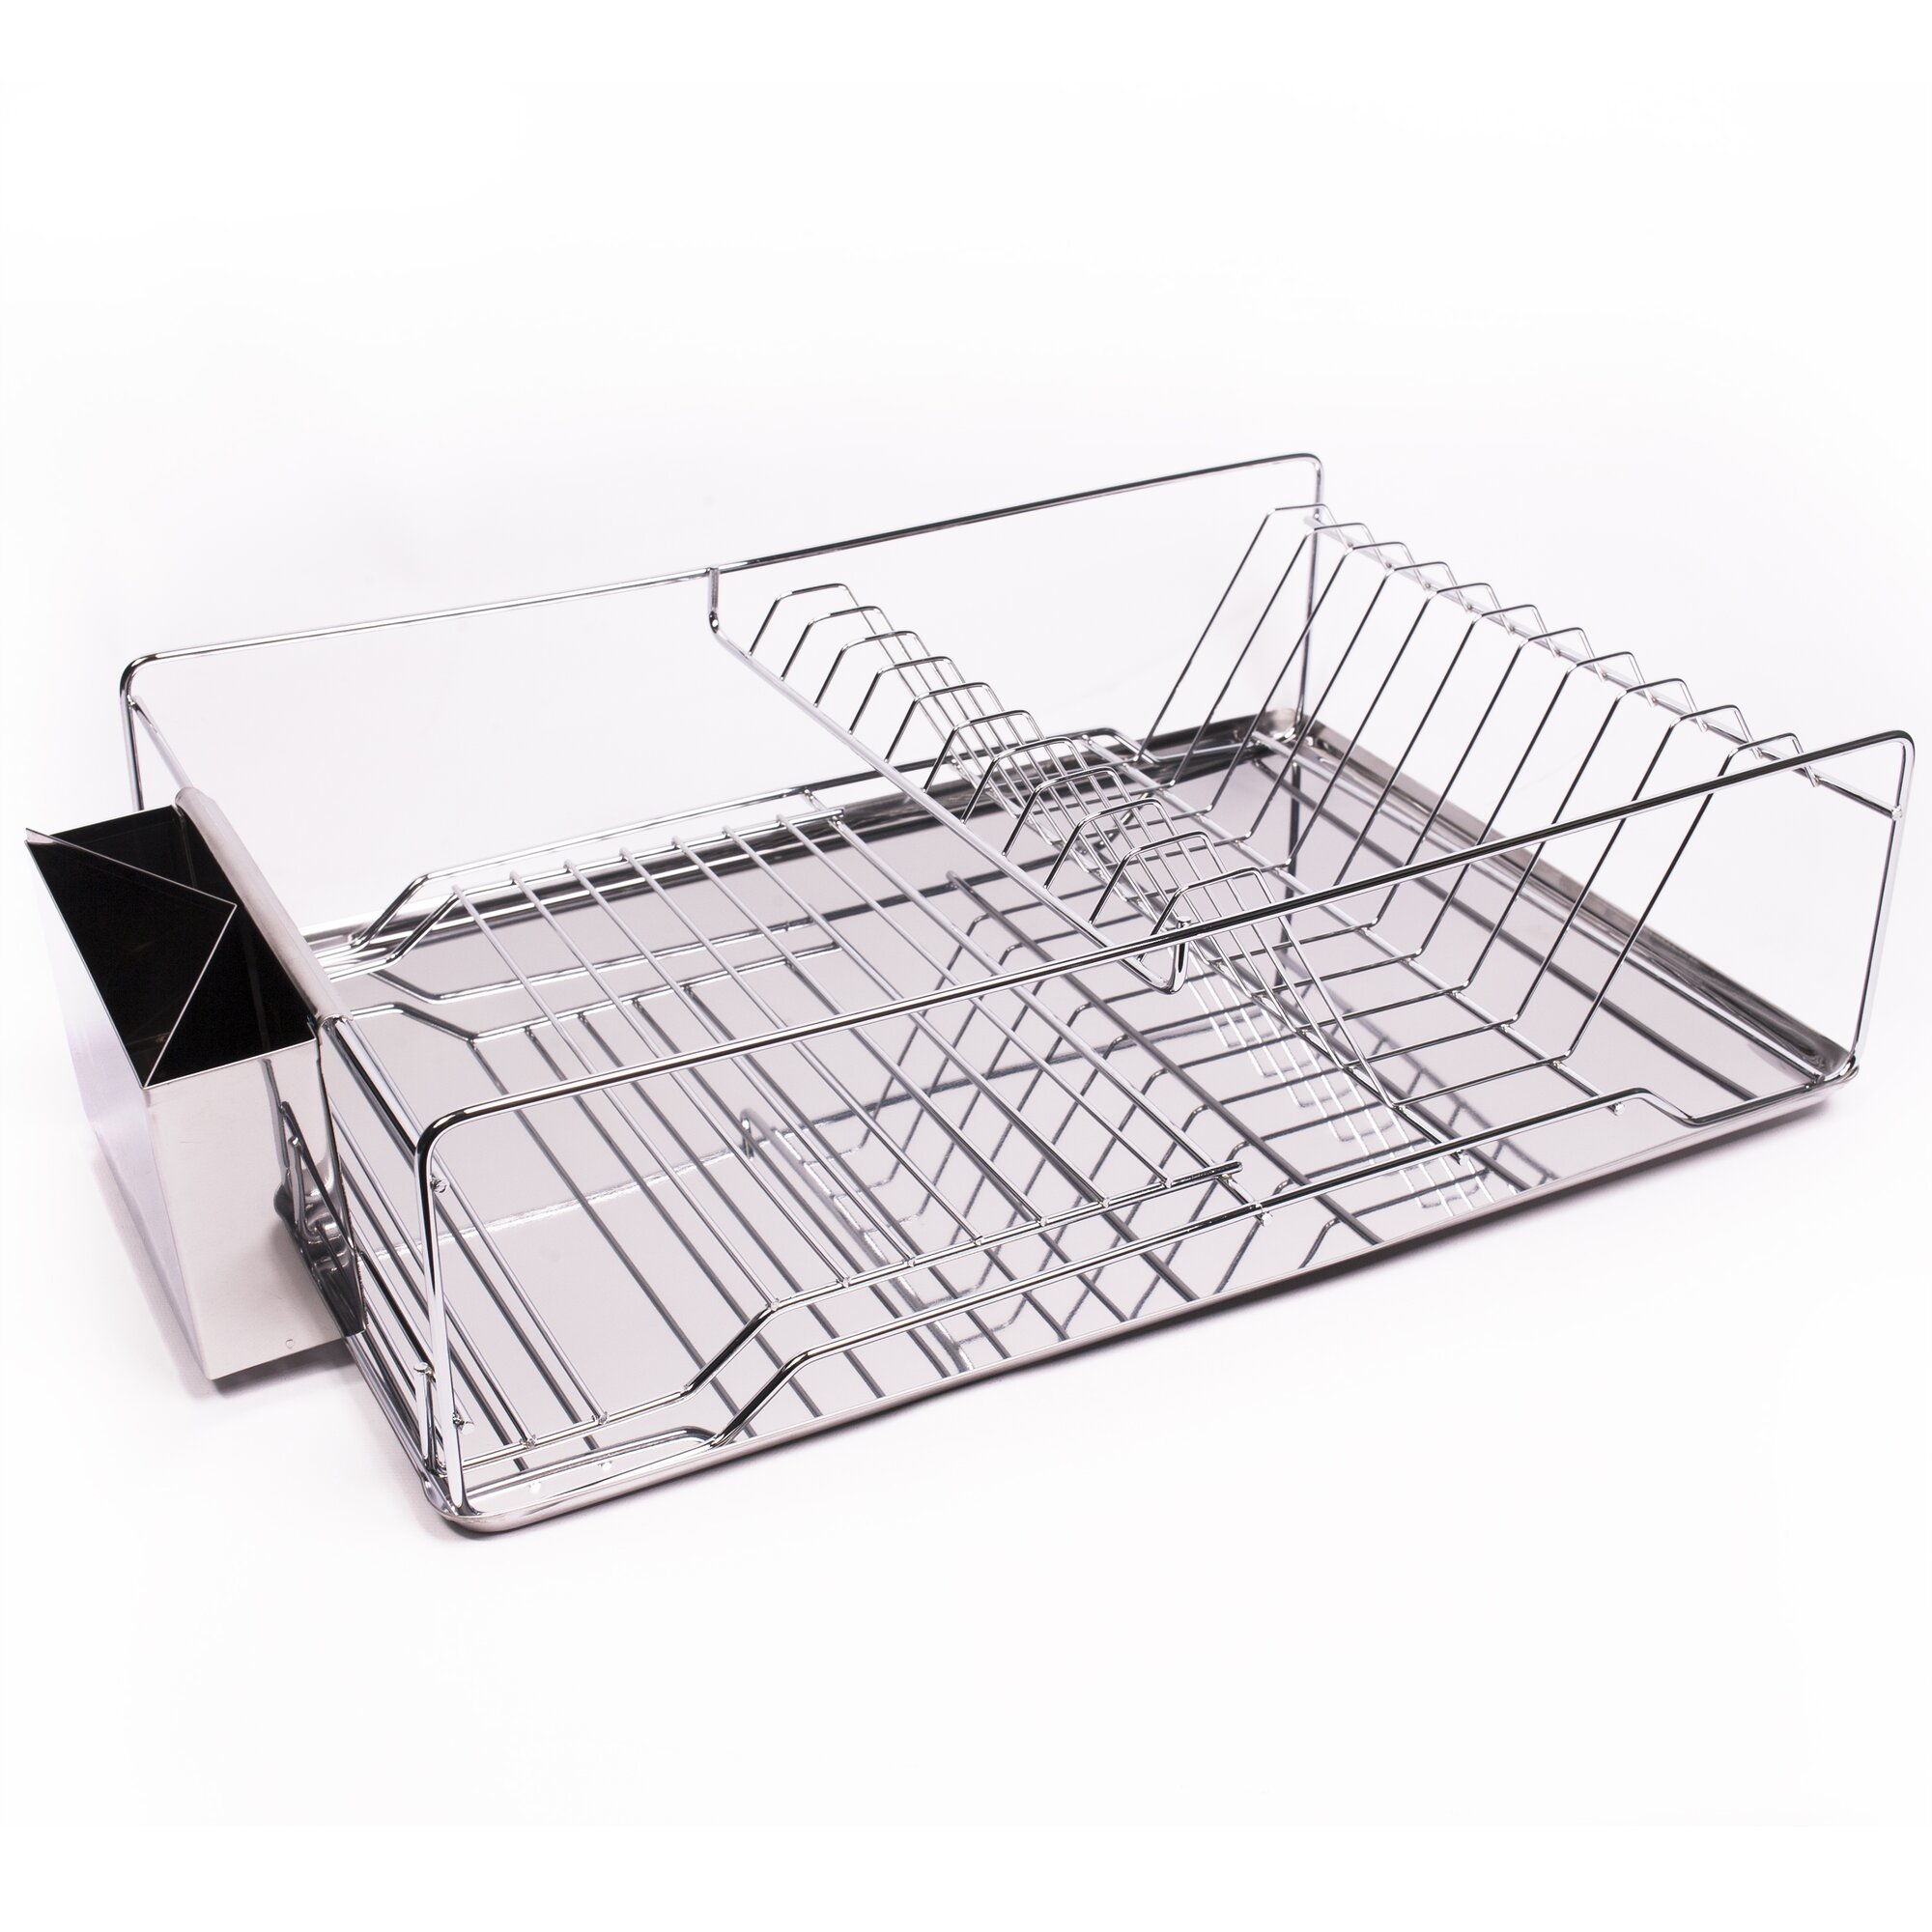 Tiers compact dish rack kitchenware dish drying rack dish drainer -  Rack Home Basics 3 Piece Kitchen Sink Dish Drainer Set